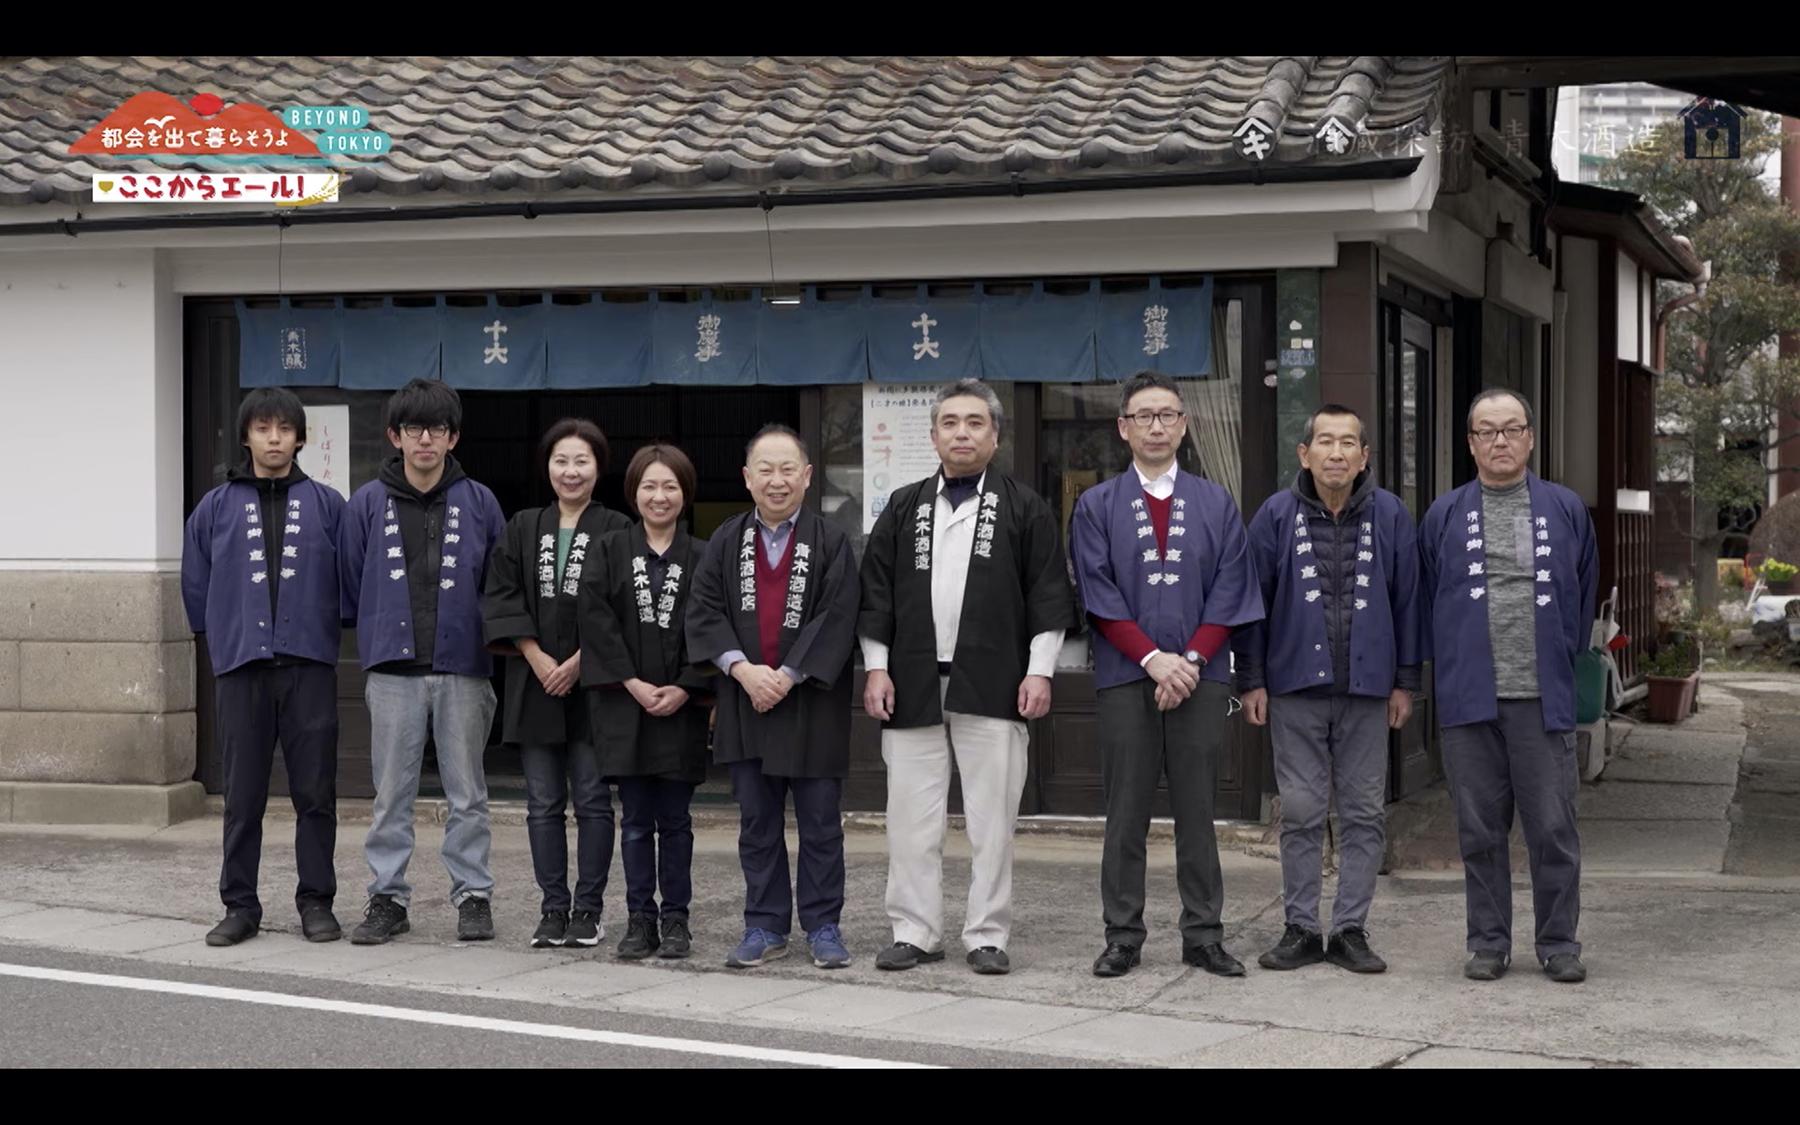 BSテレビ東京・新番組 『都会を出て暮らそうよ BEYOND TOKYO』に出演しました